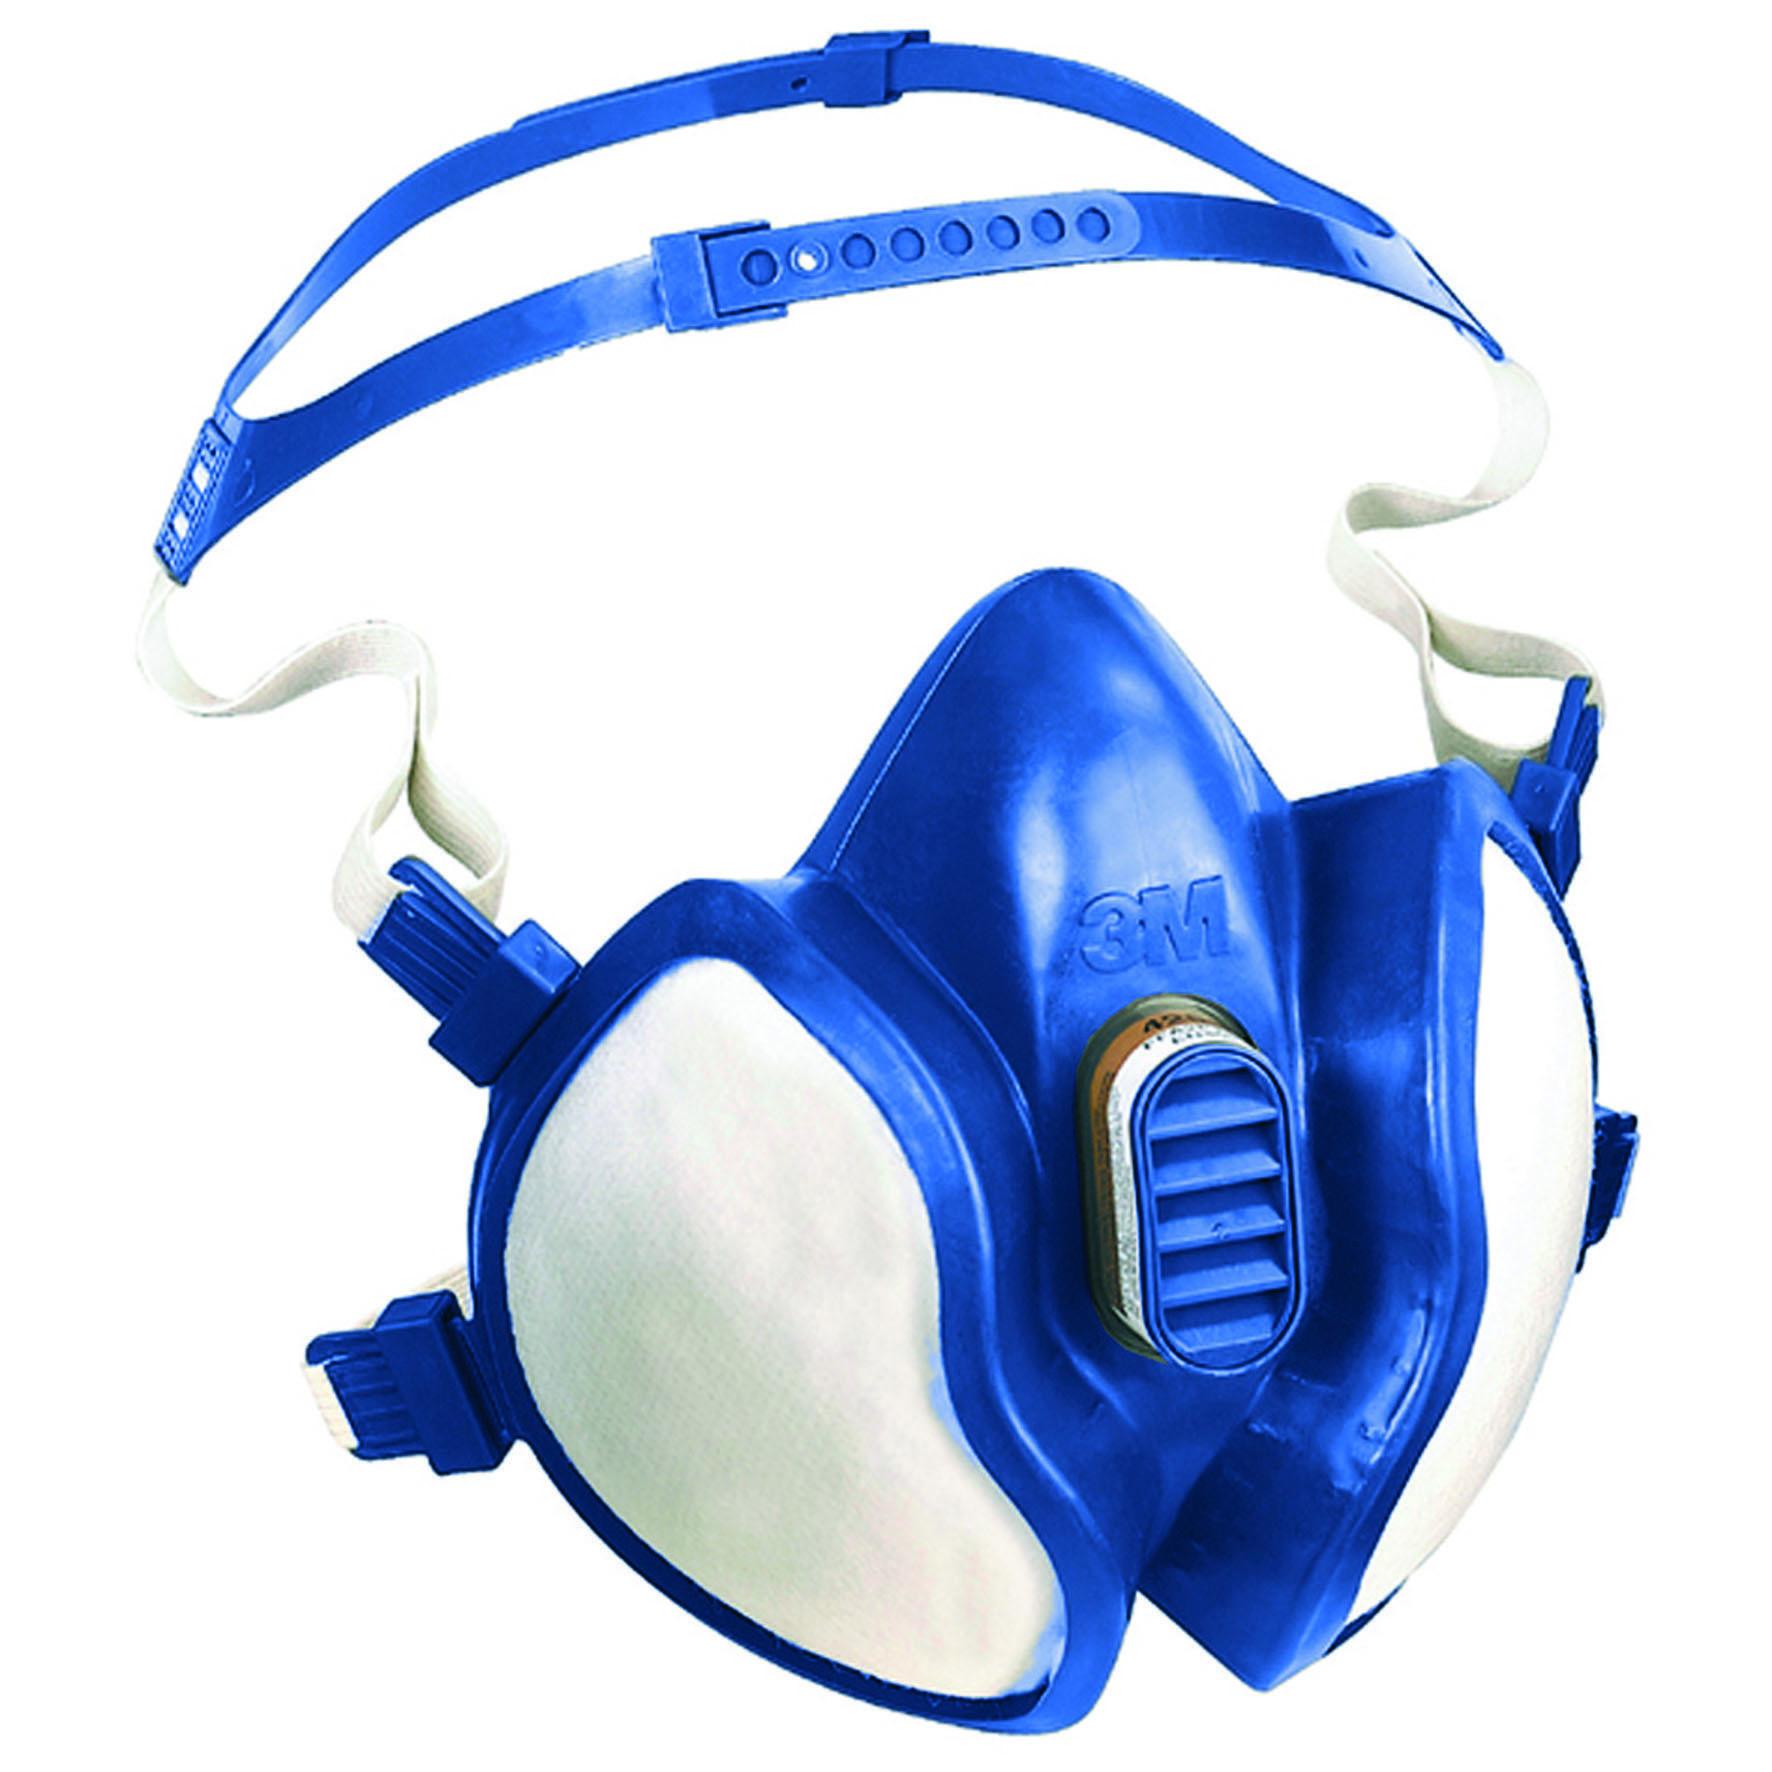 3M™ Bezúdržbová polomaska s integrovanými filtry FFA1P2RD - organika a částice, 4251+